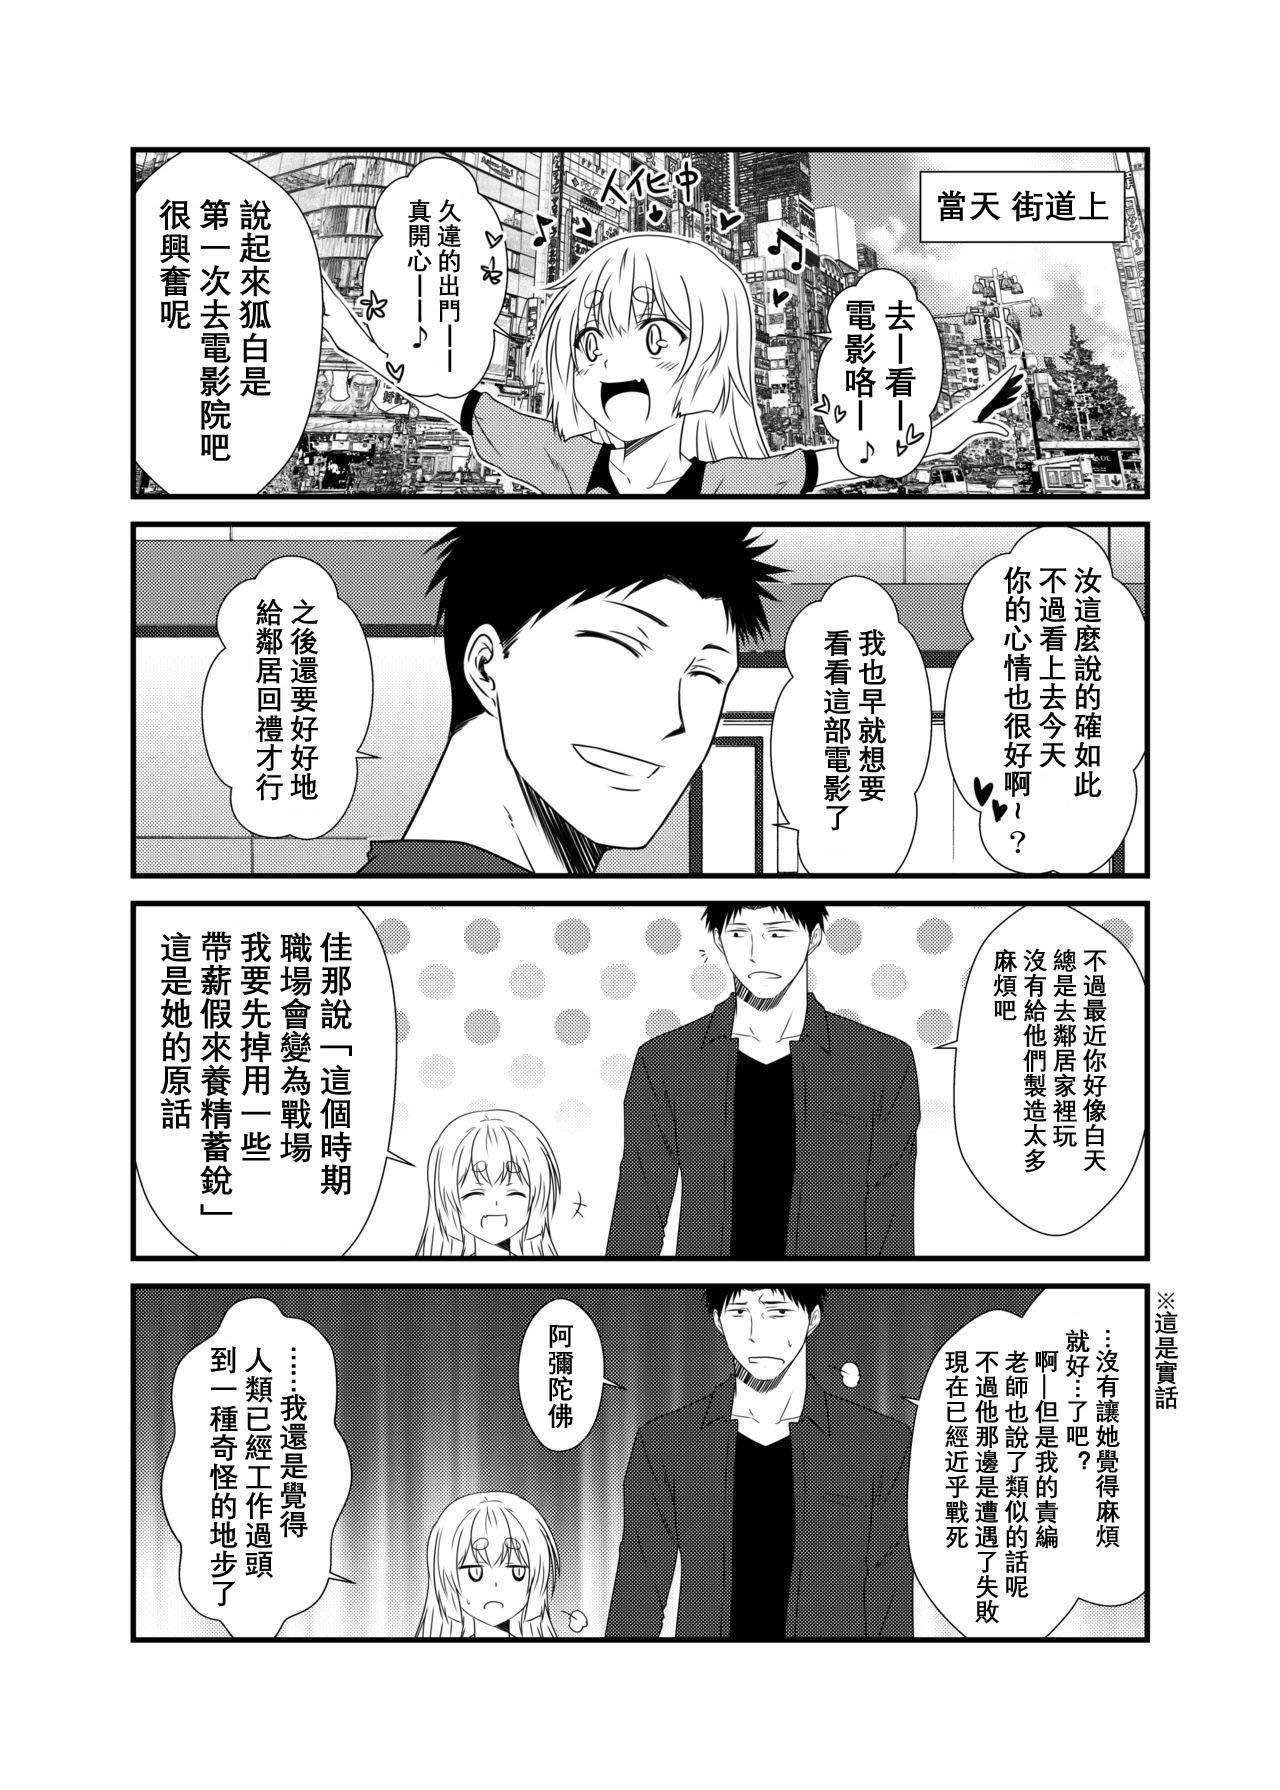 Kohaku Biyori Vol. 5 8